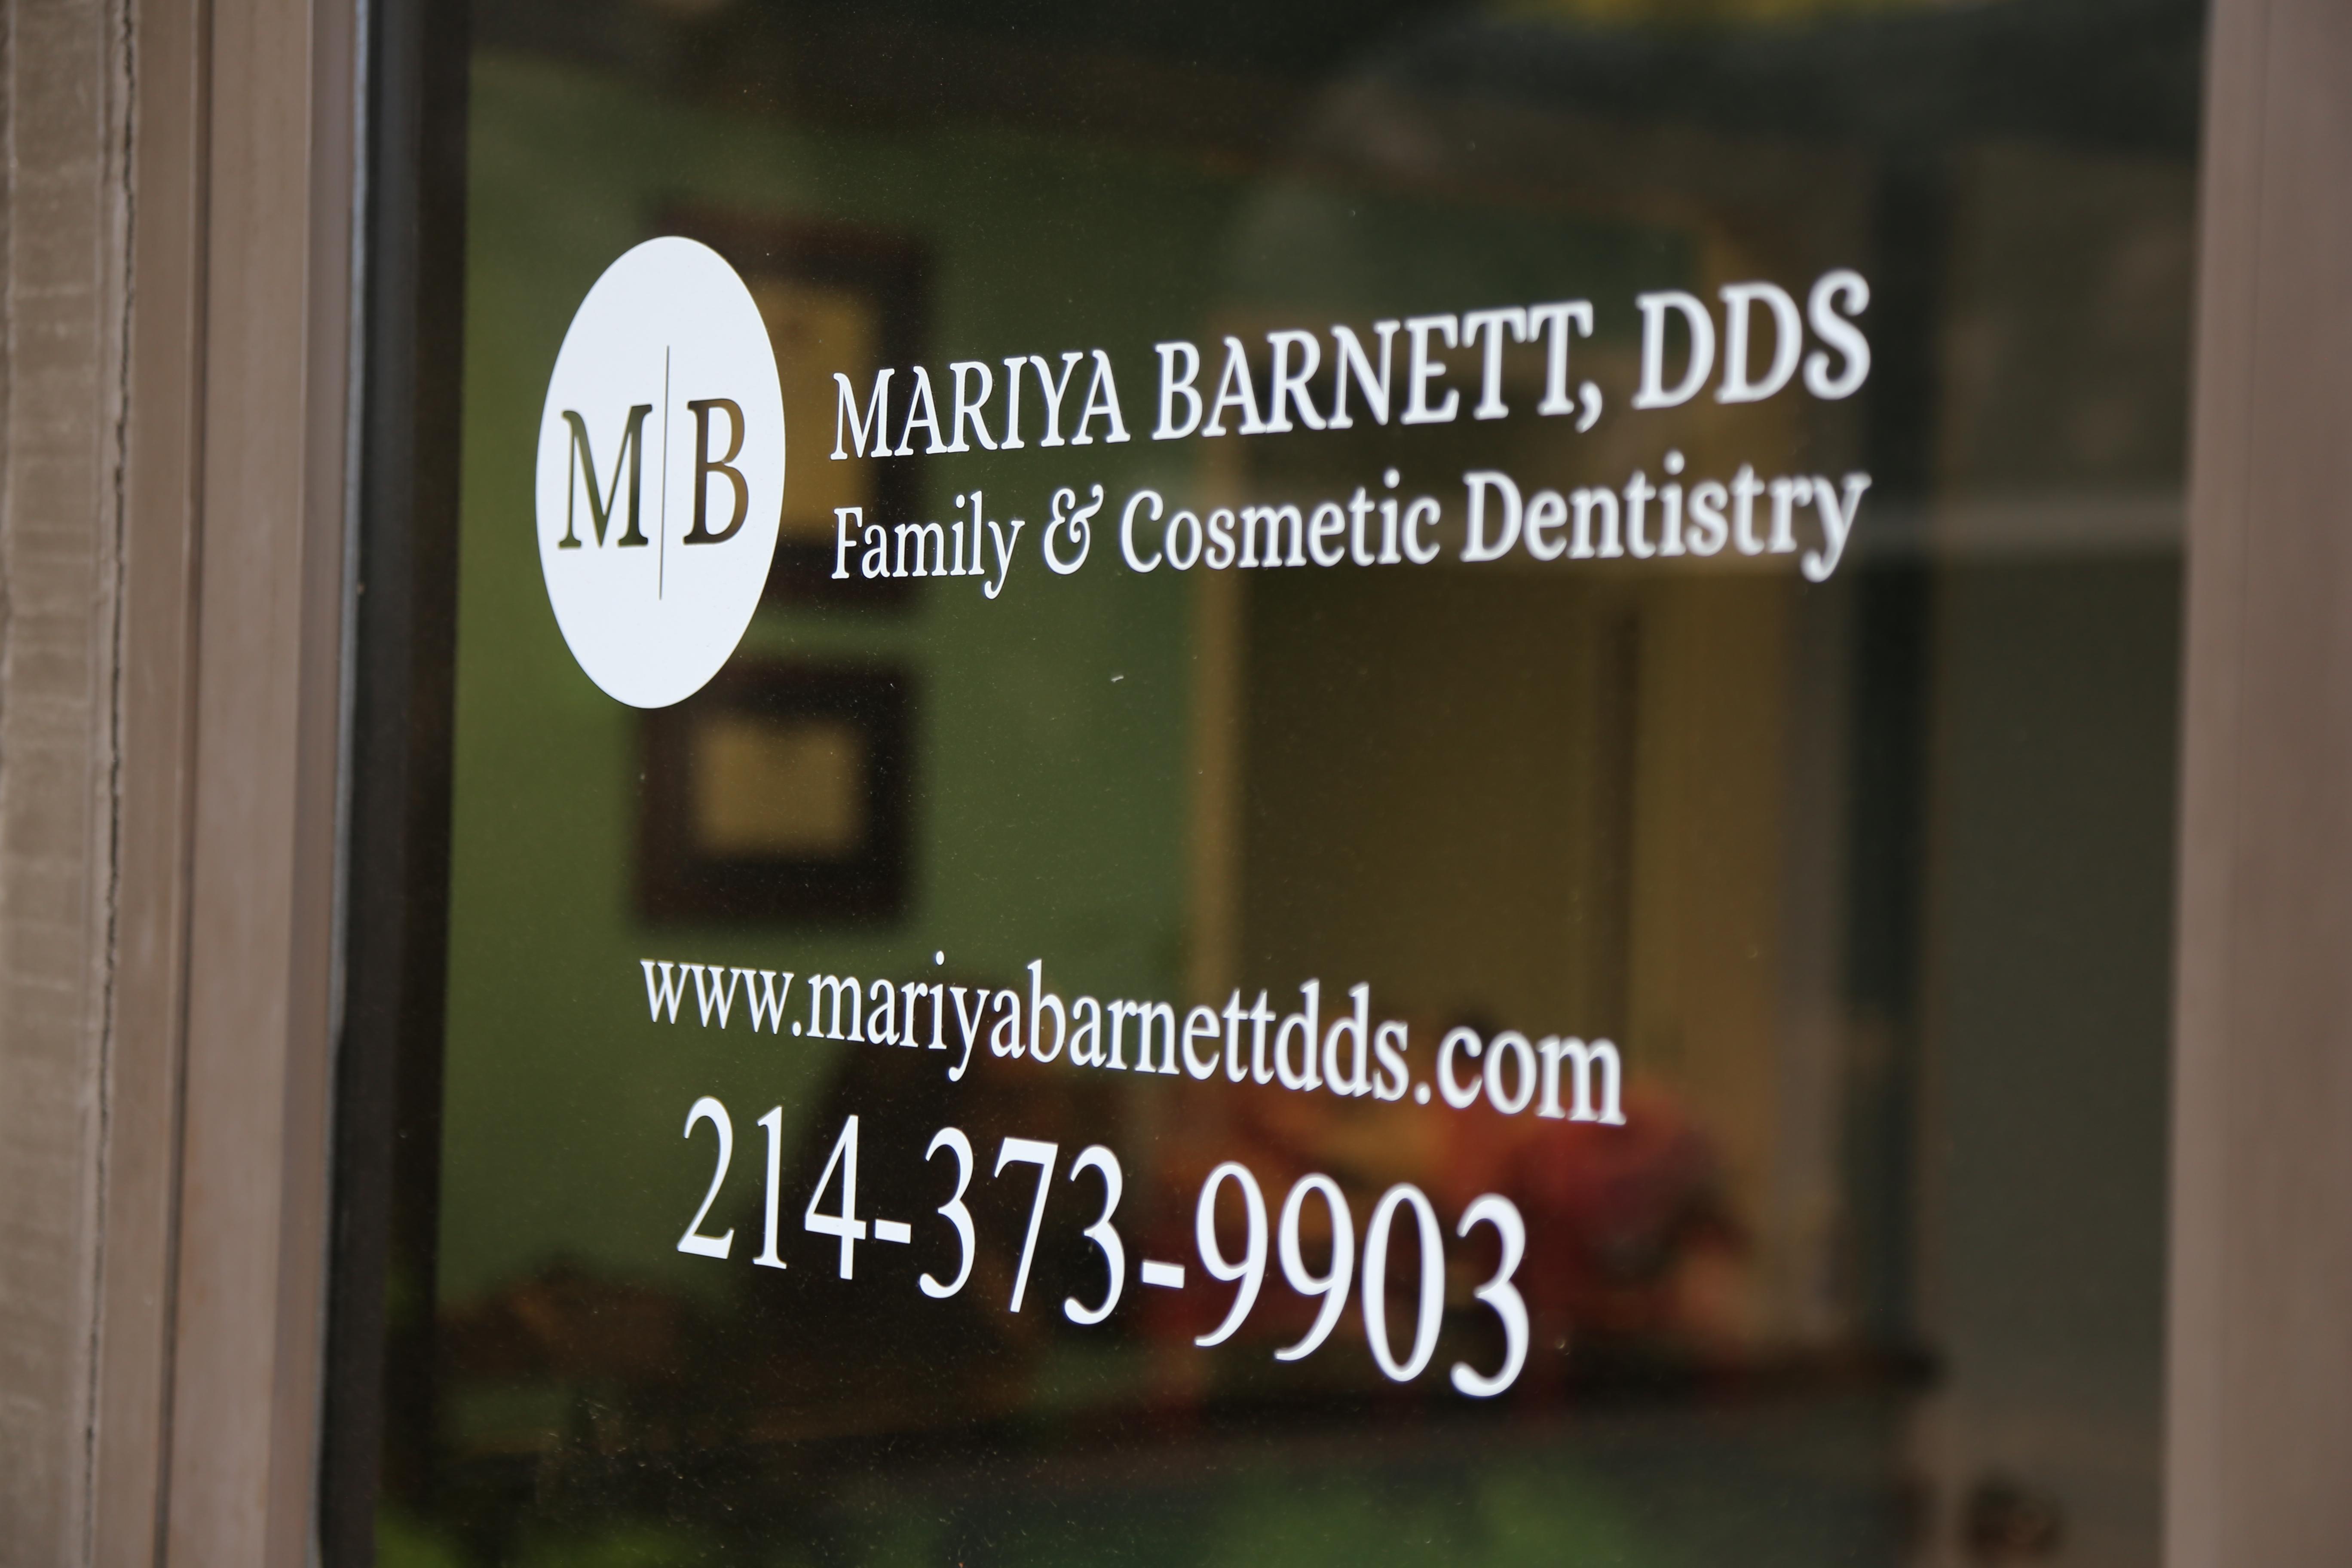 Mariya Barnett, DDS Family & Cosmetic Dentistry